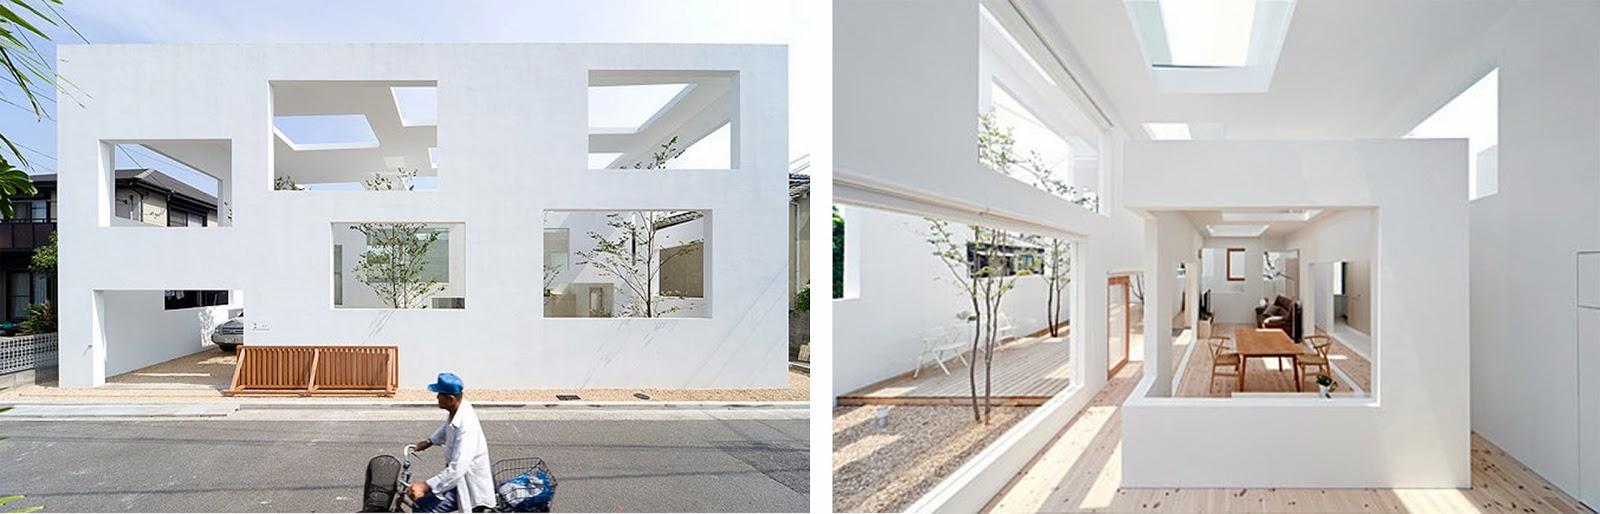 Arqpress13 espacio abierto for N house sou fujimoto